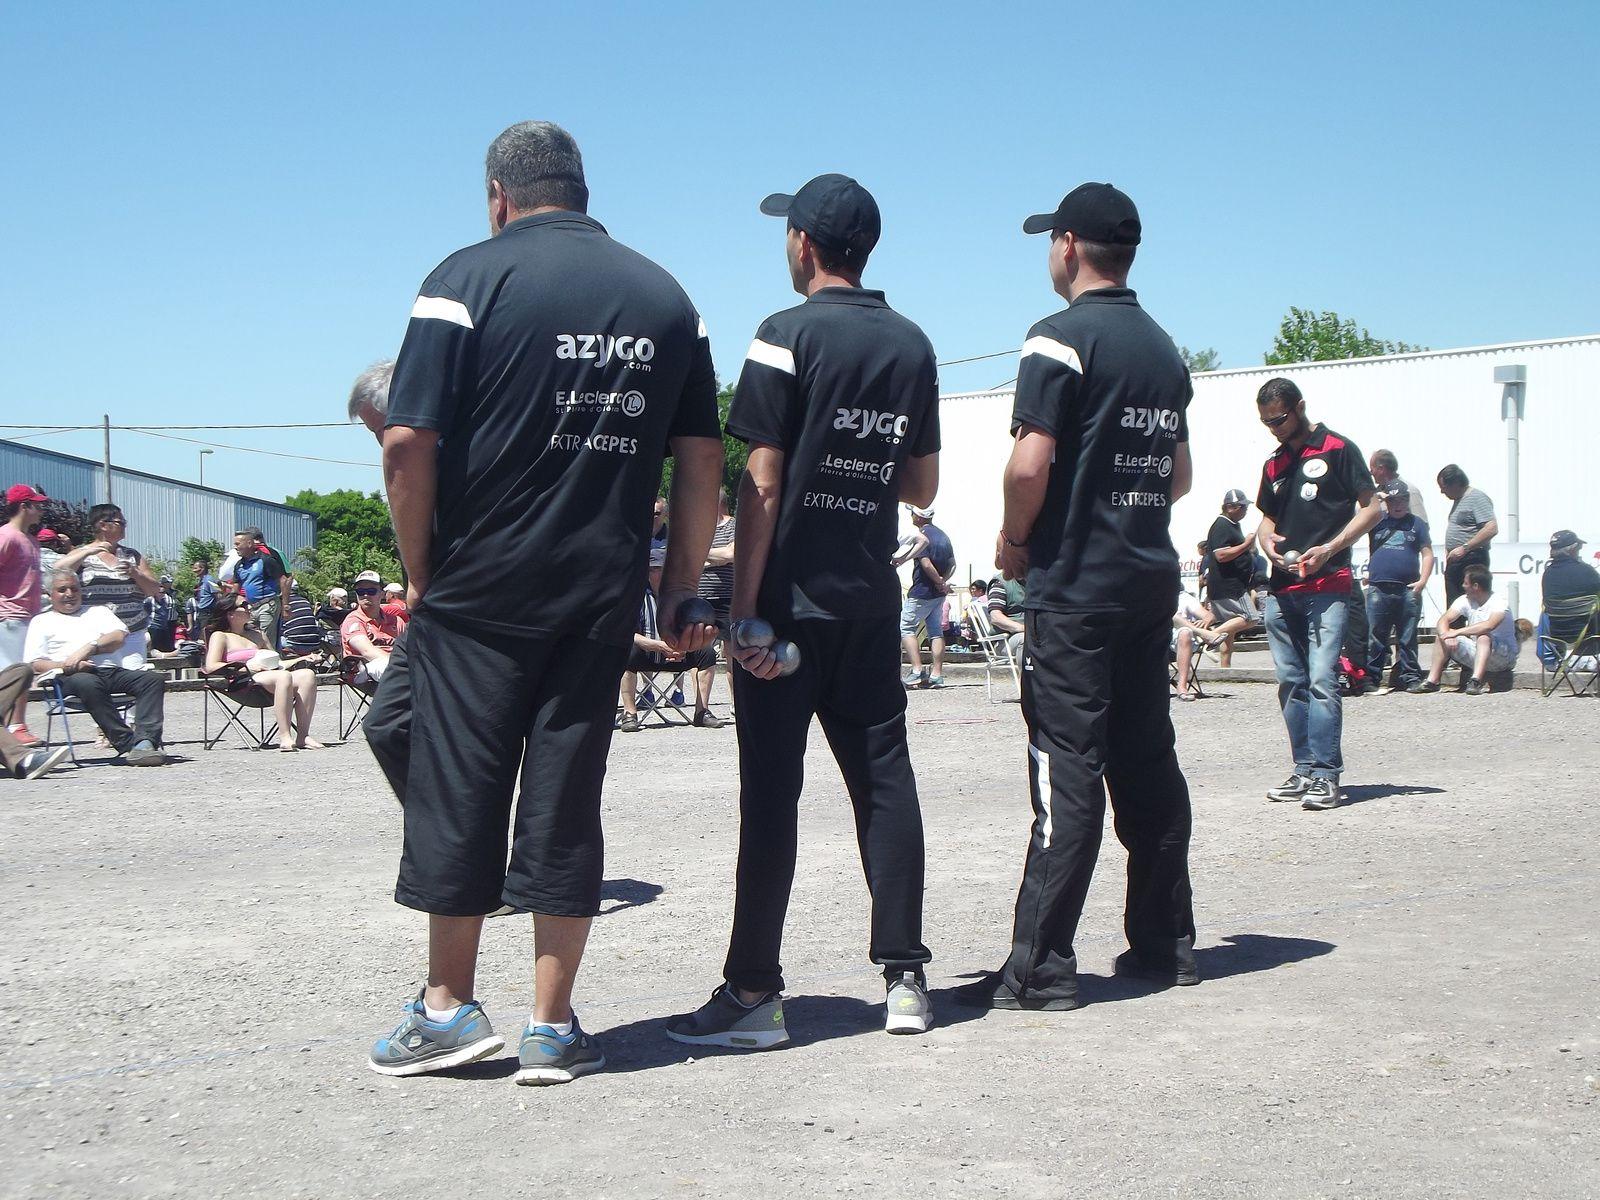 Triplettes masculines du 25 mai 2017